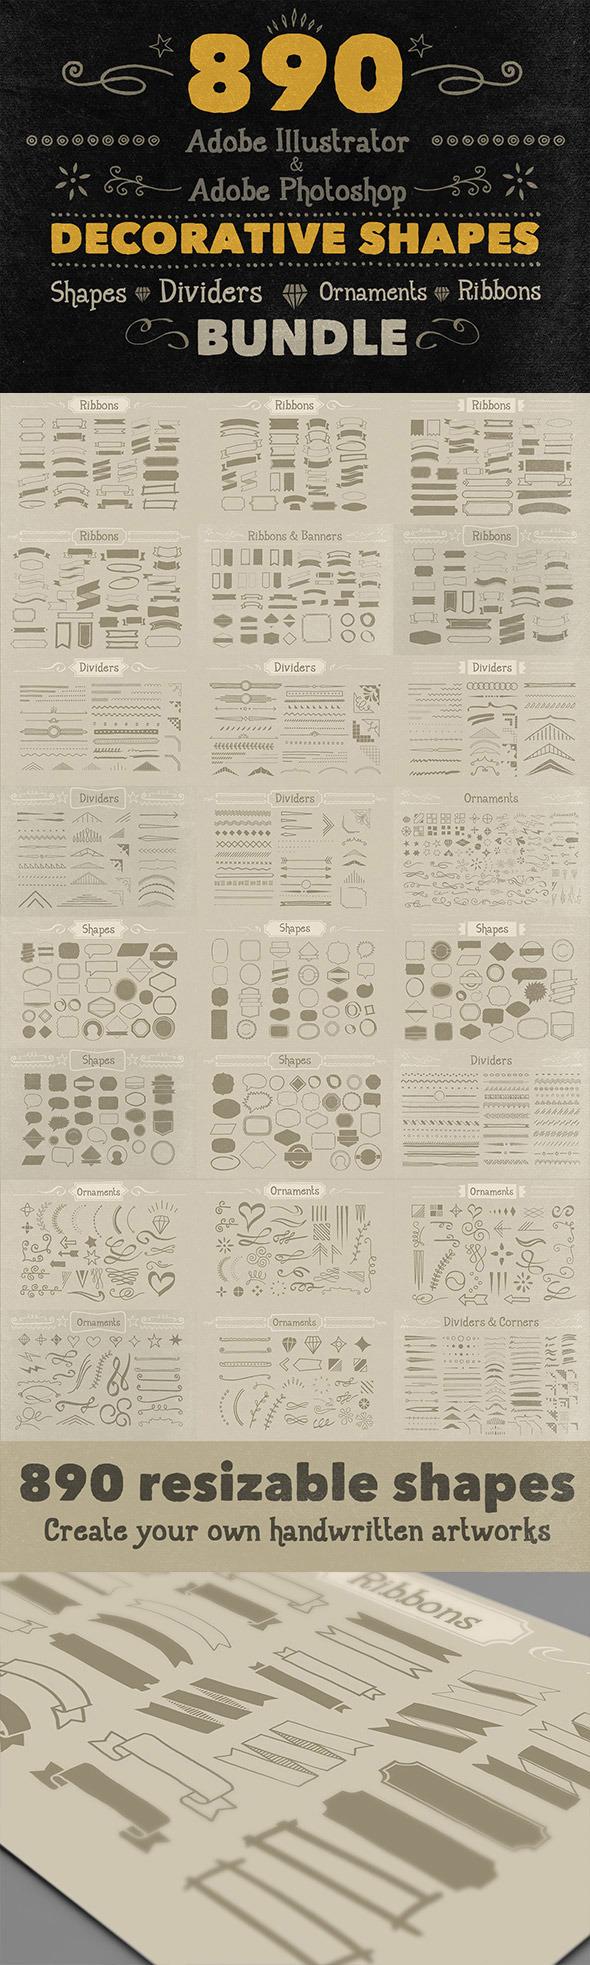 890 Handwritten Shapes - Bundle